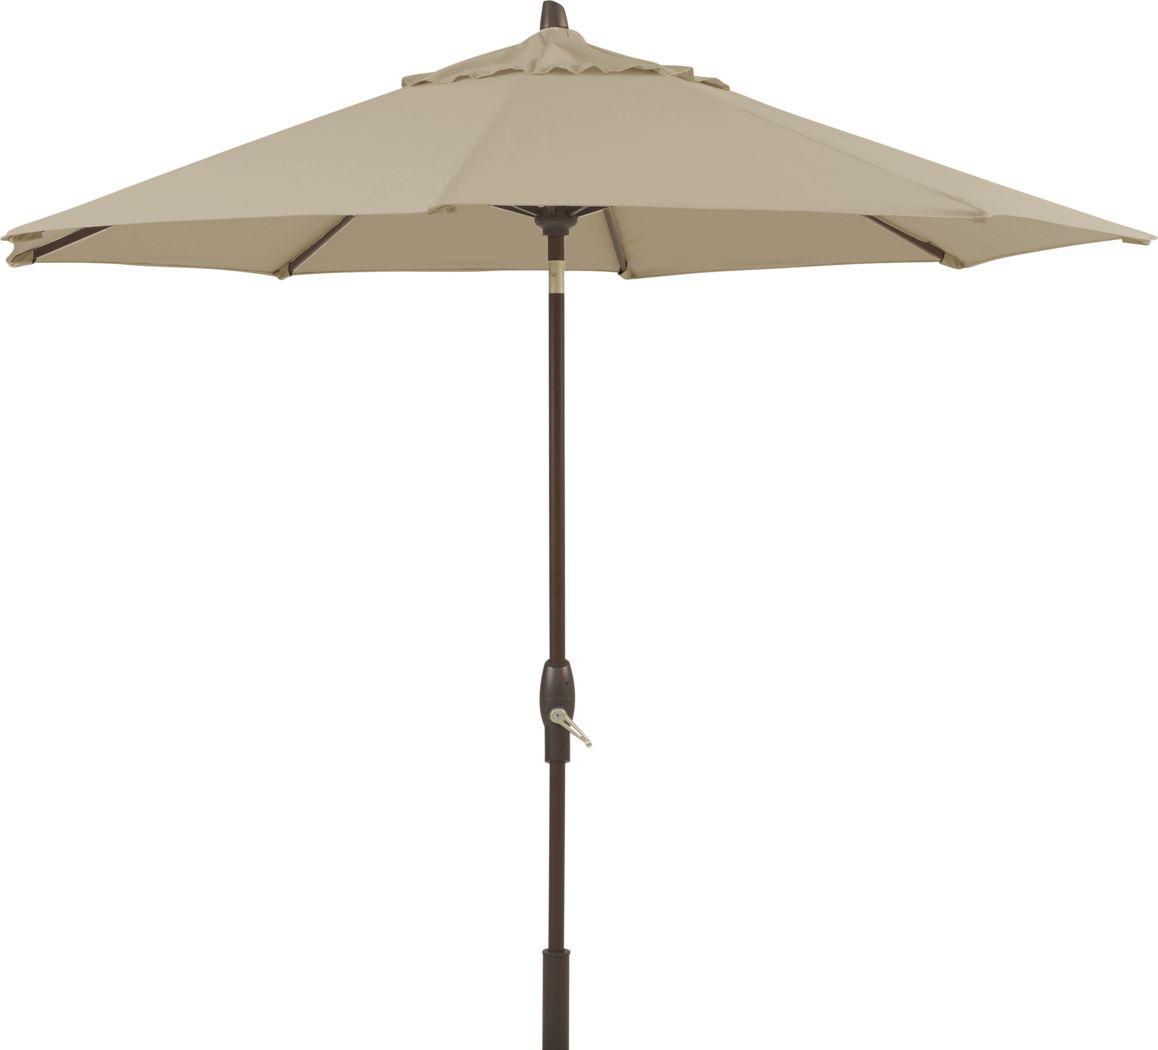 Seaport 9' Octagon Stone Outdoor Umbrella